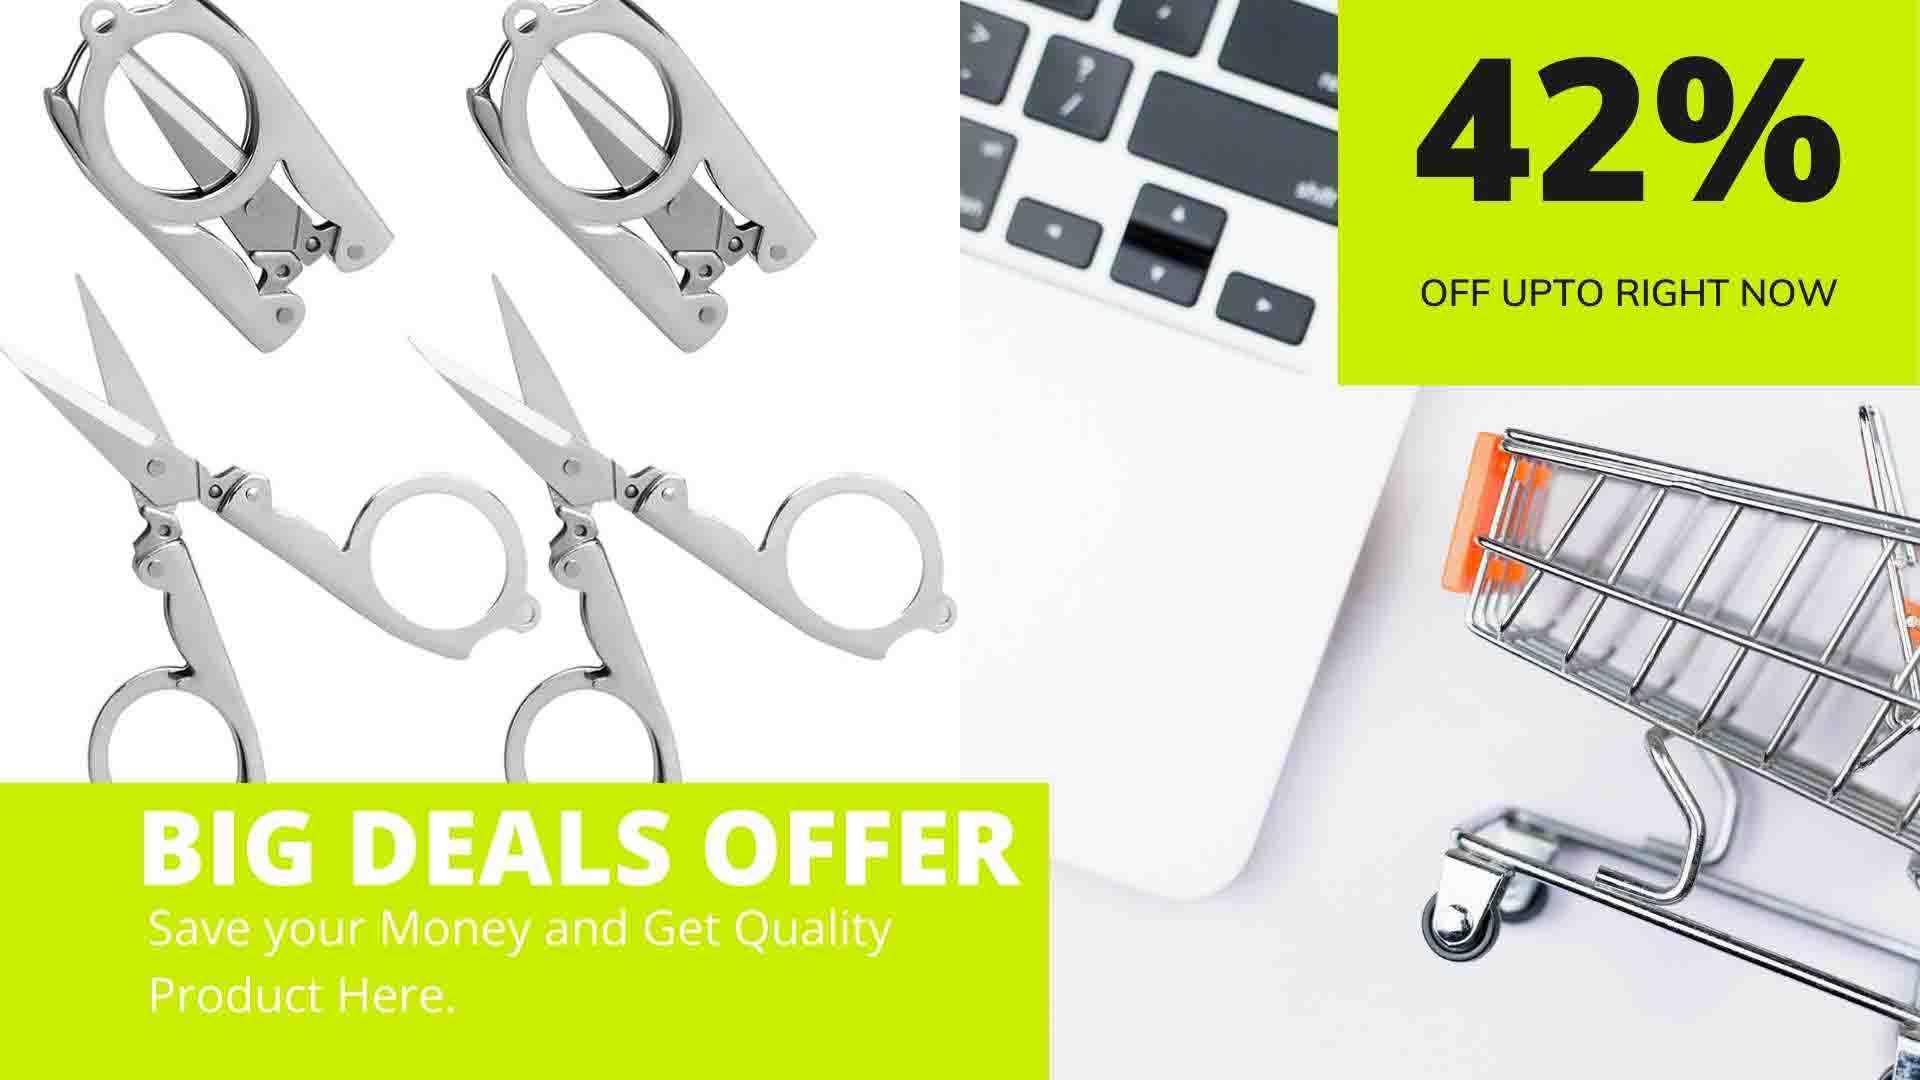 Best Folding Scissors with Huge Discount